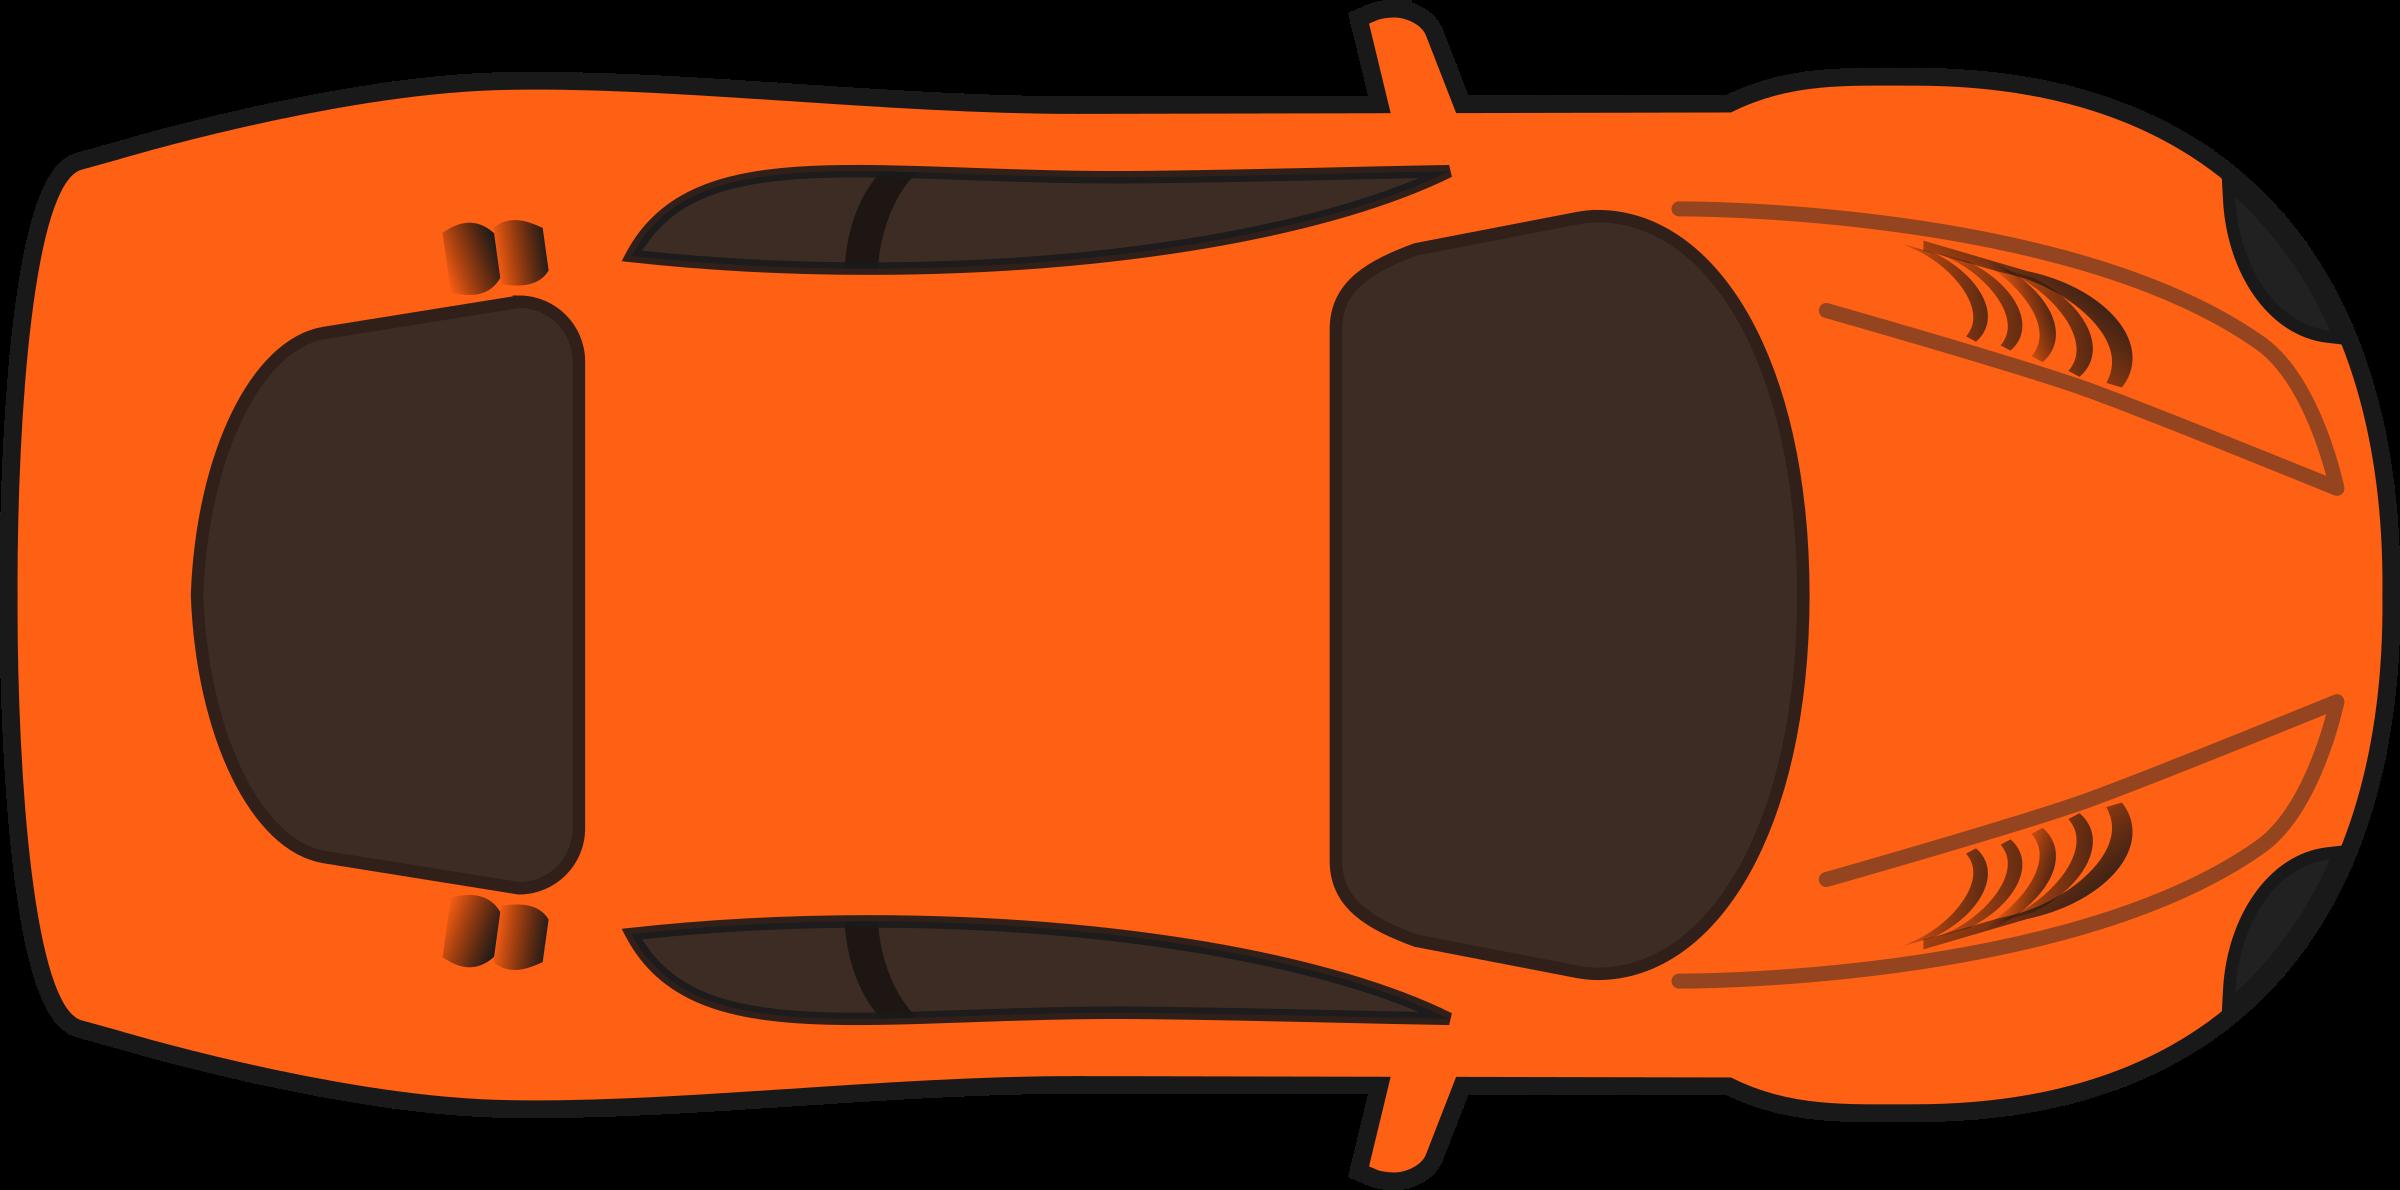 Race car top down clipart 3 » Clipart Station.